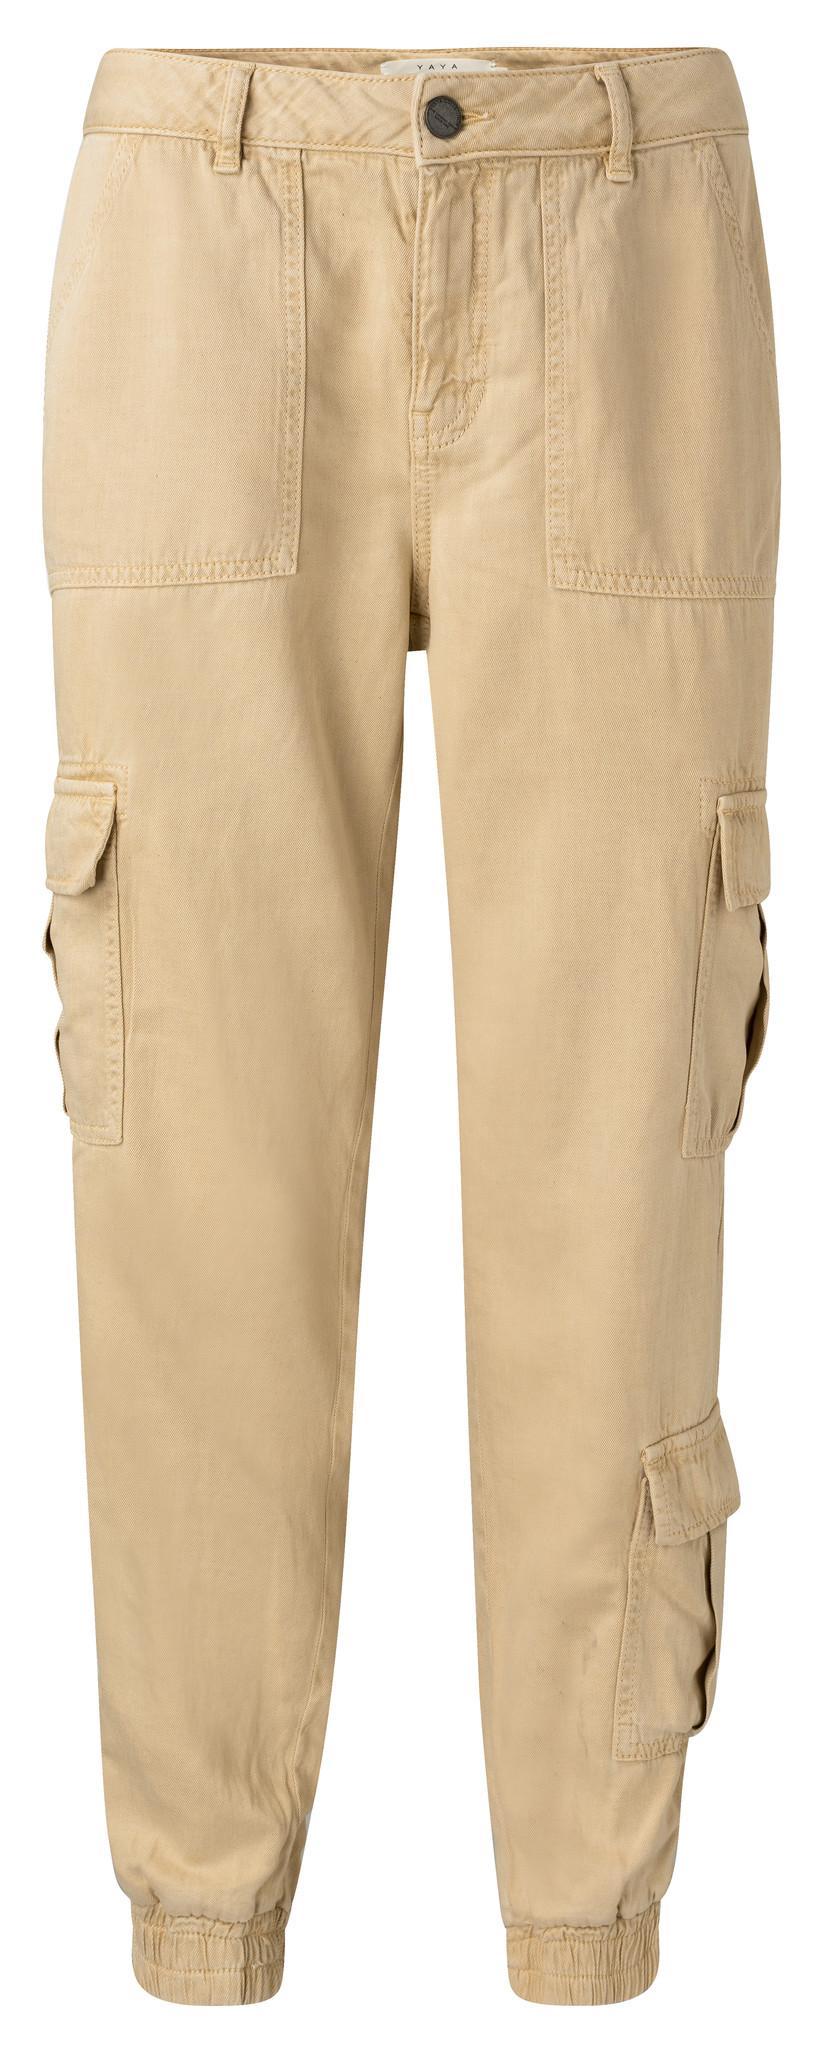 yaya Cargo trousers with 1201147-115-1